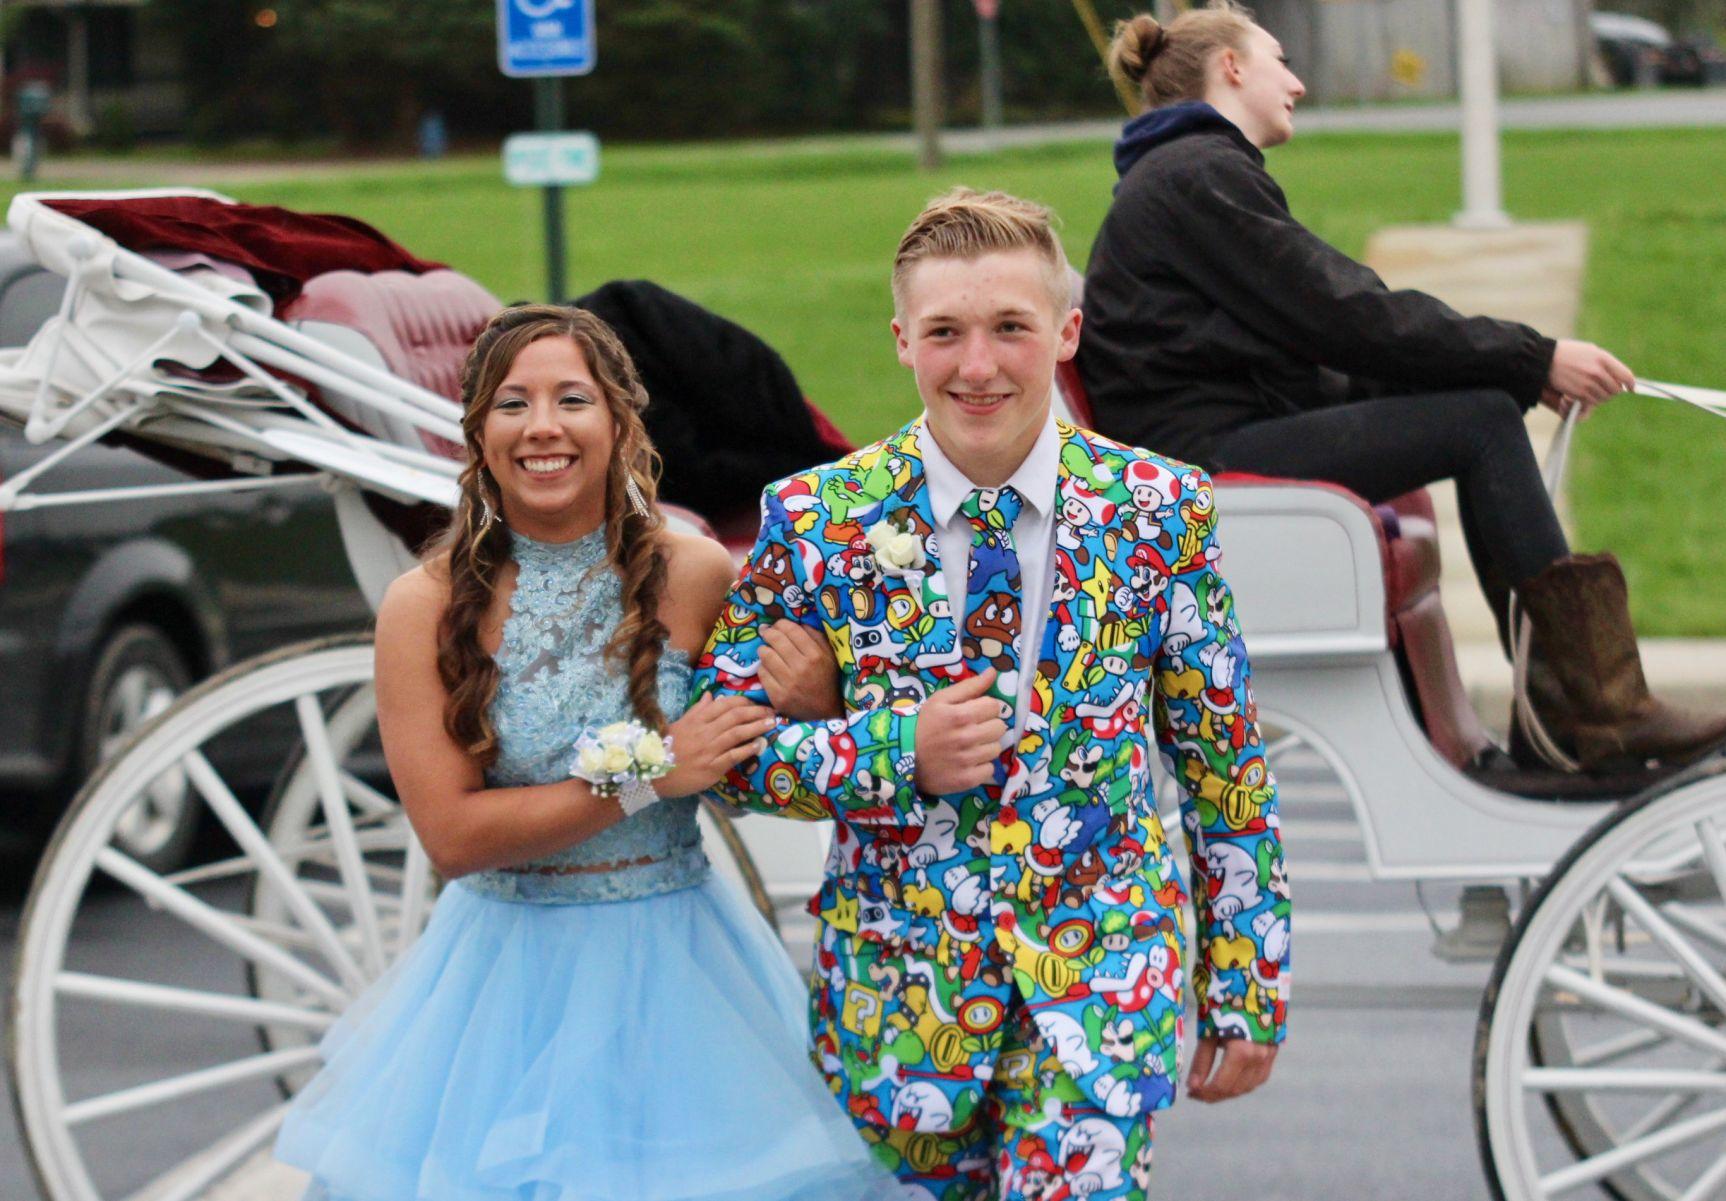 GALLERY: Crestline High School Prom 2019